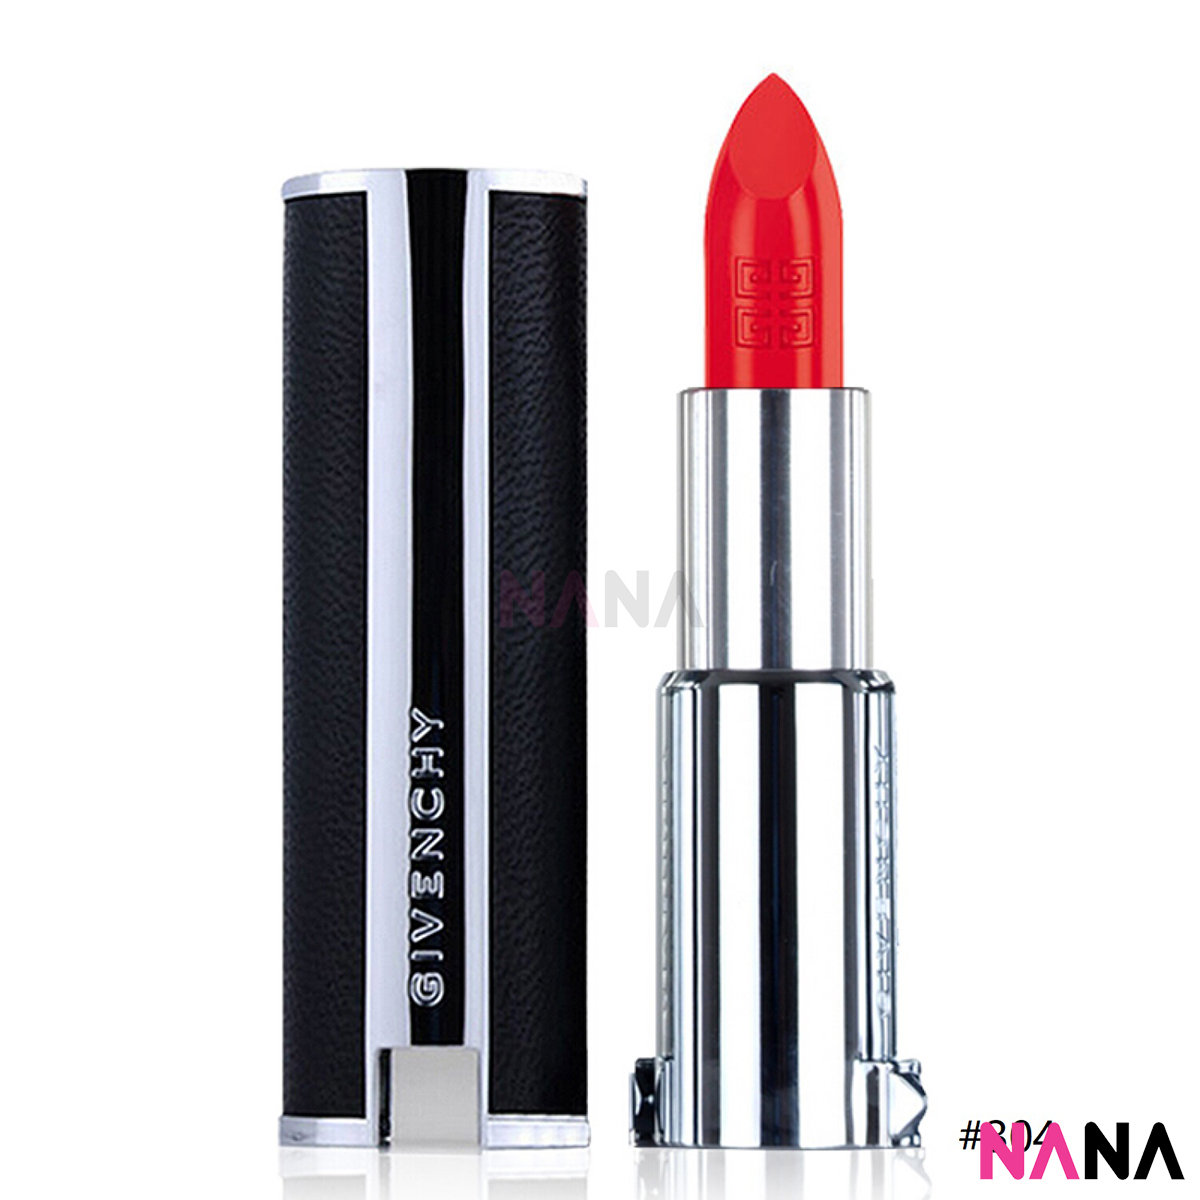 Le Rouge Intense Color Sensuously Mat Lip Color #304 Mandarine Bolero 3.4g